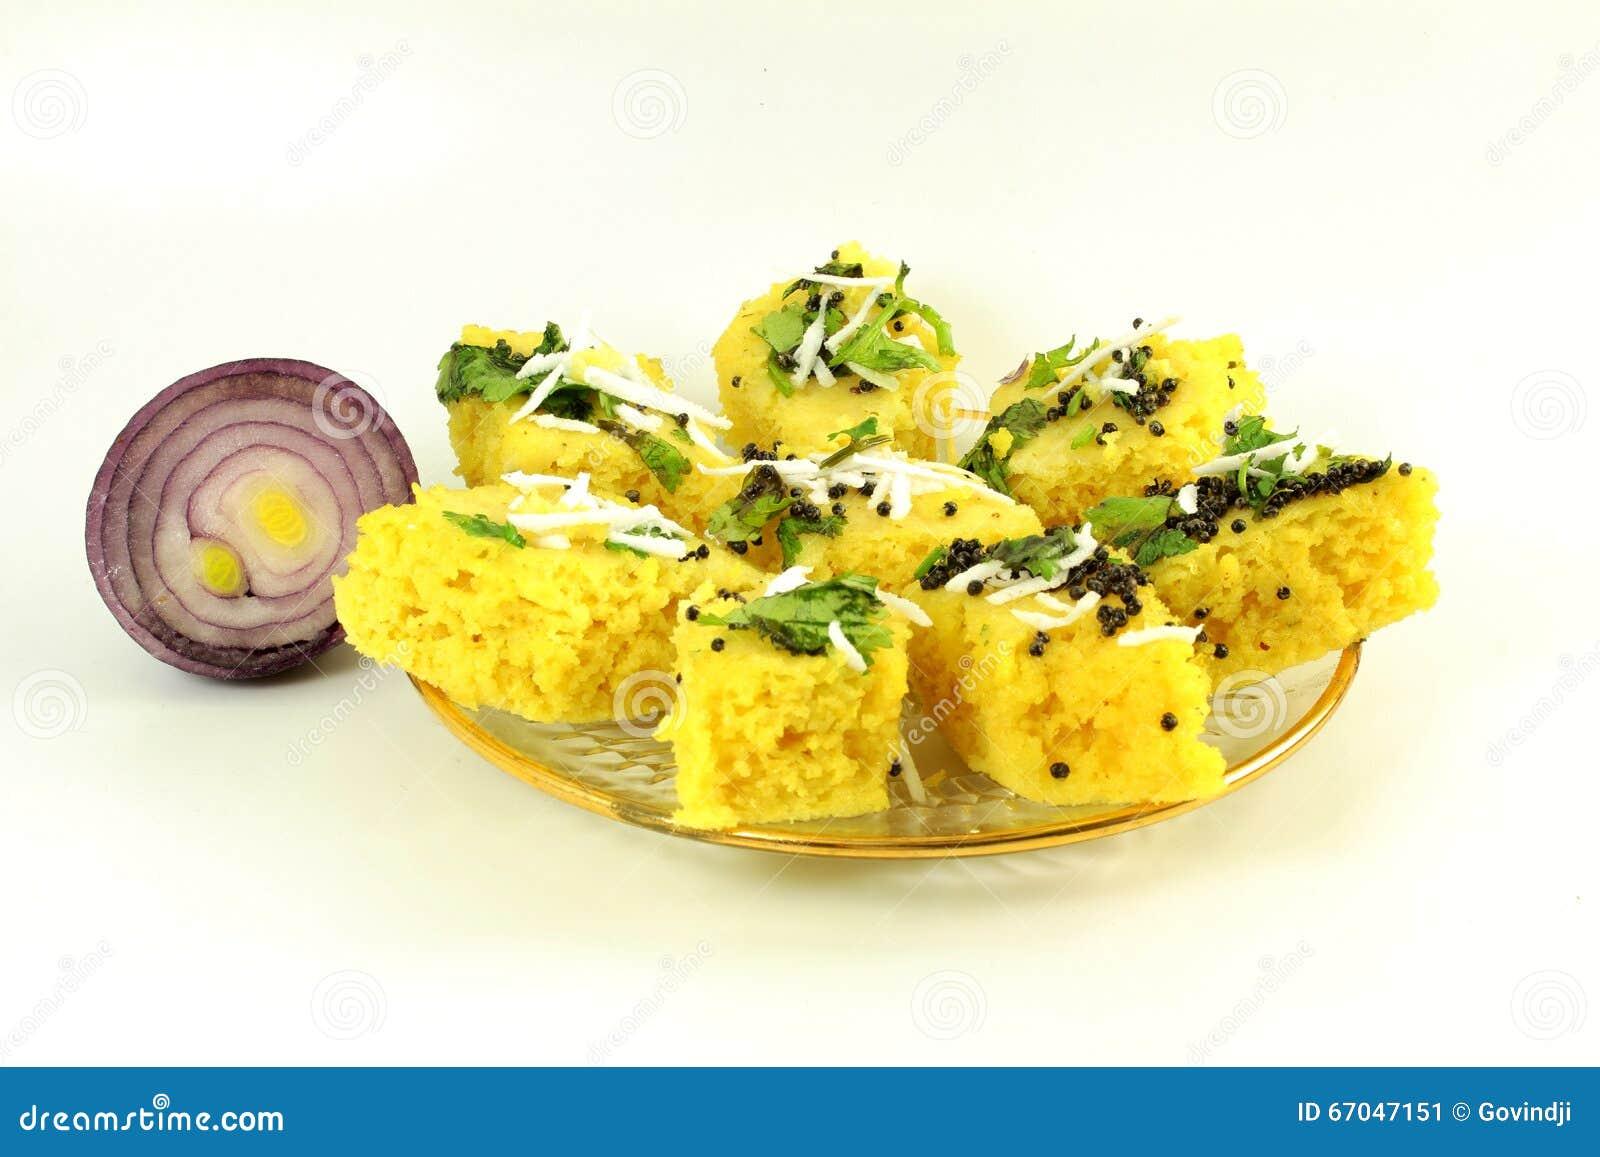 How To Make Indian Food Dhokla